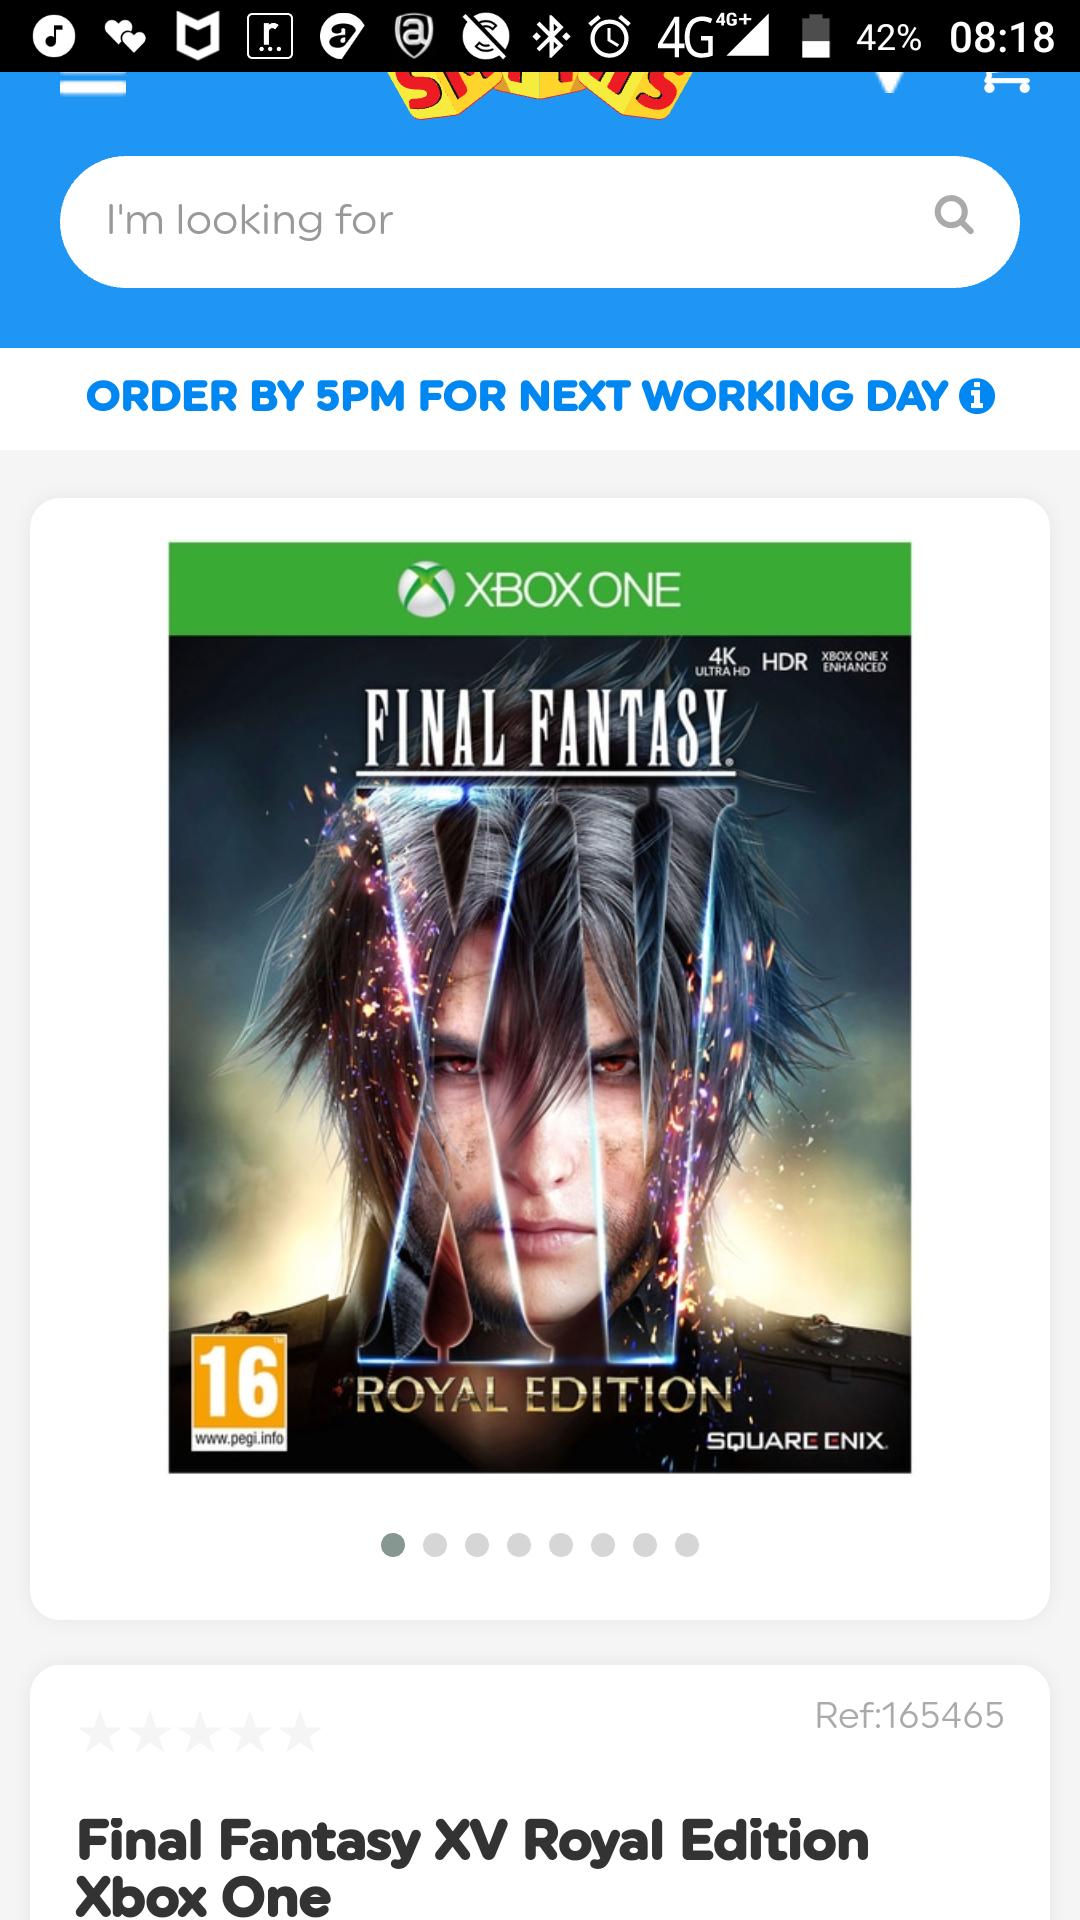 Final fantasy 15 royal edition Xbox one £14.99 Smyths Toys